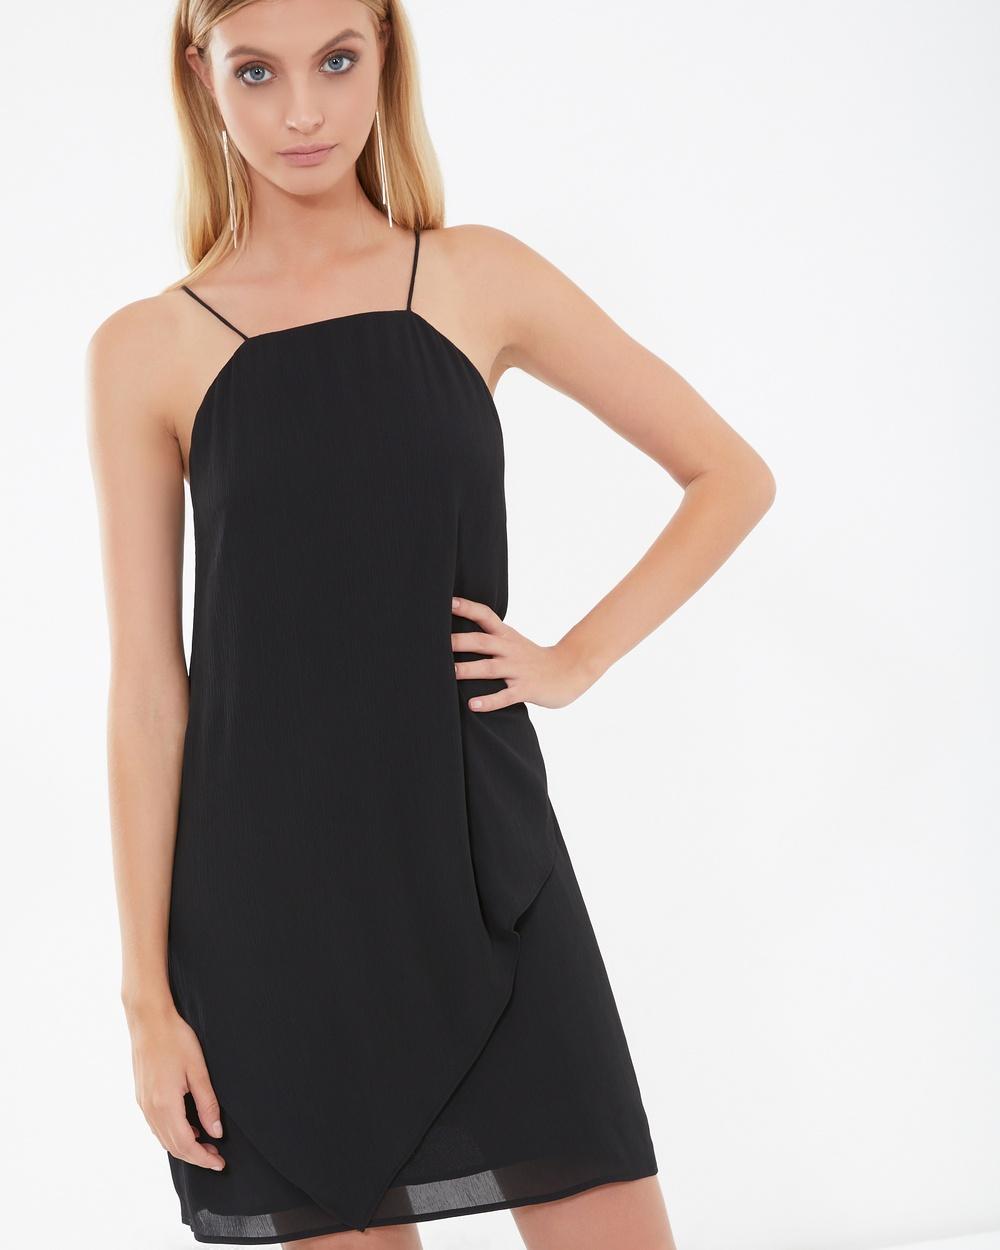 Photo of Tussah Black Stella Dress - beautiful dress from Tussah online